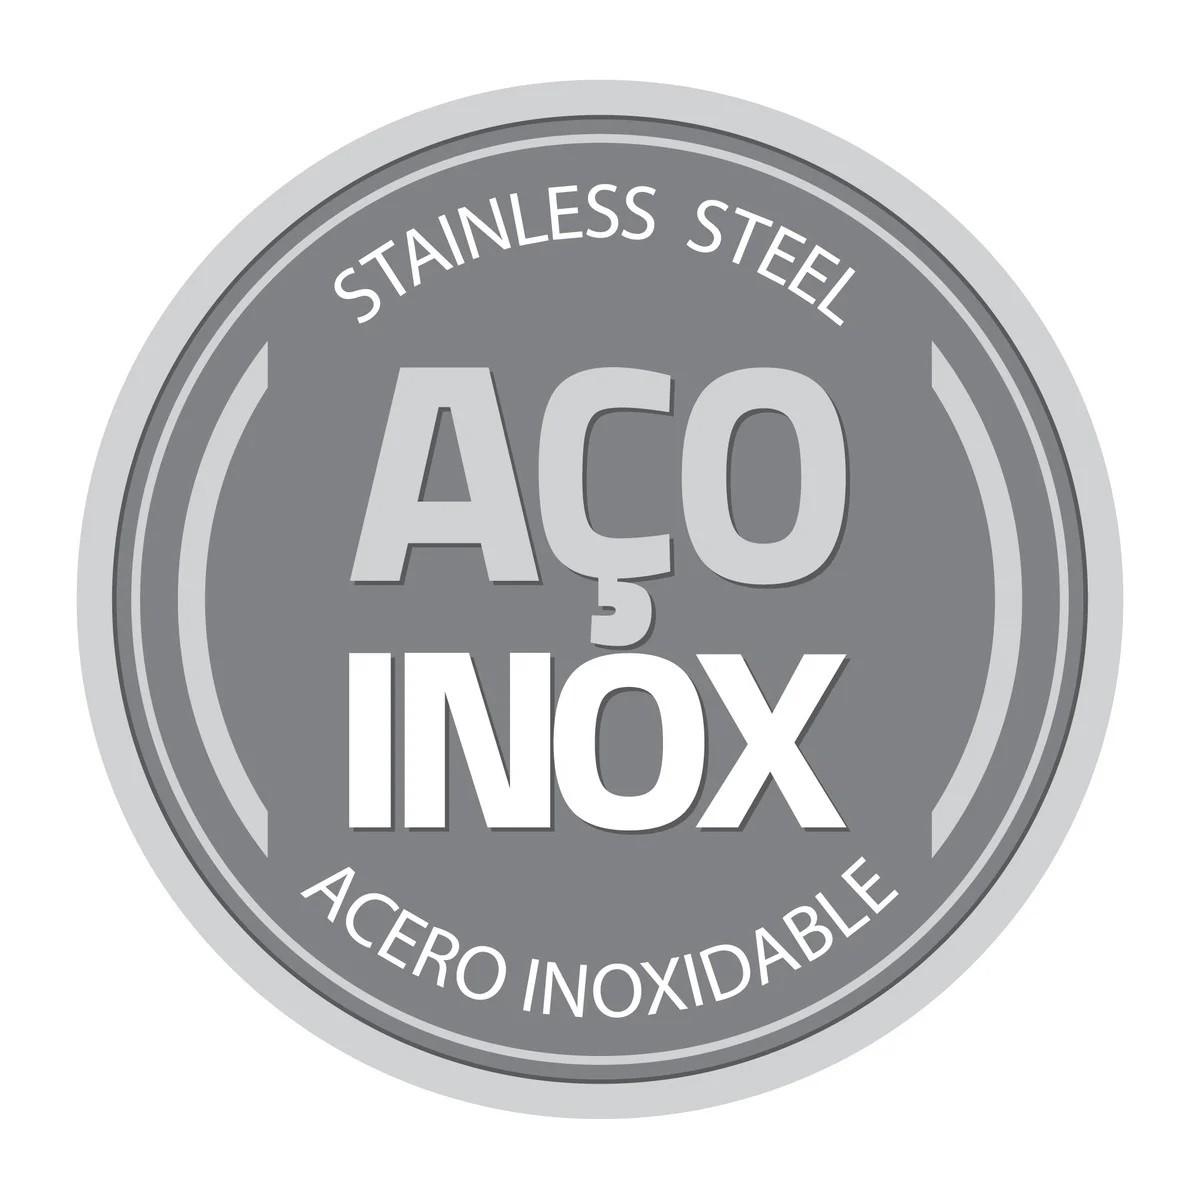 Caçarola Rasa Inox Professional 24 Cm Trix Cobre Tramontina  - Sua Casa Gourmet e Cia